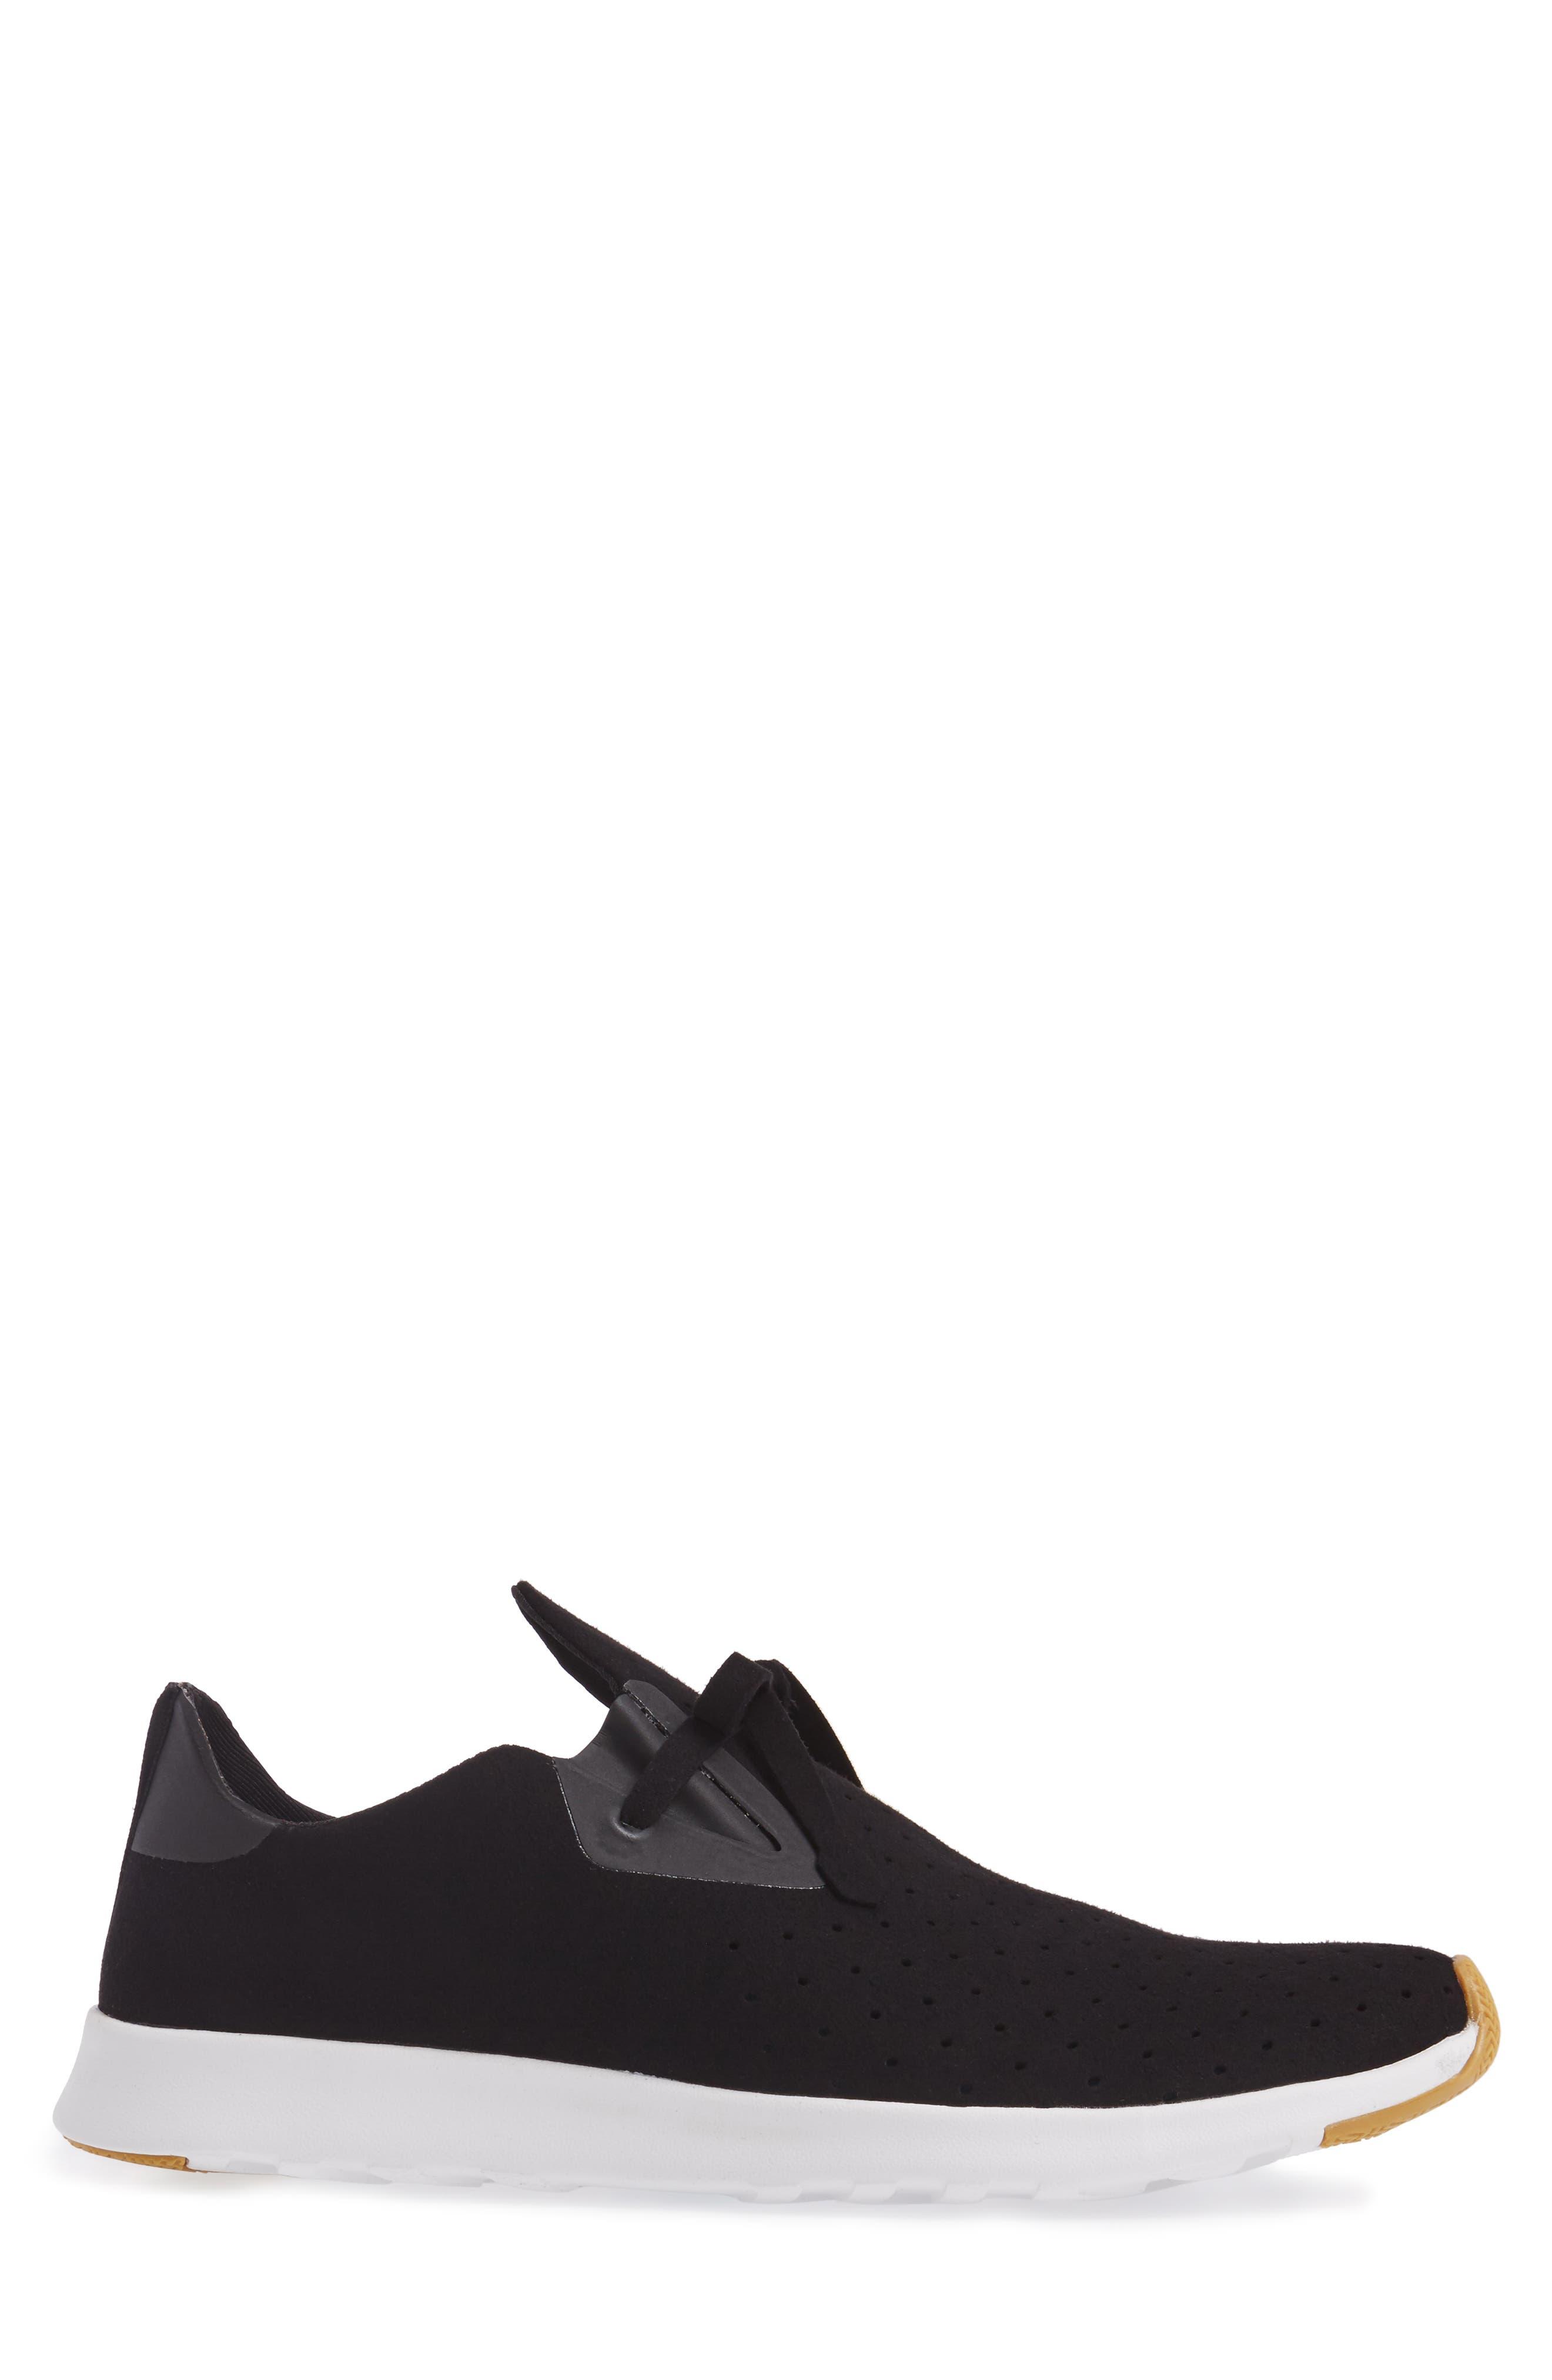 Alternate Image 3  - Native Shoes 'Apollo' Sneaker (Men)